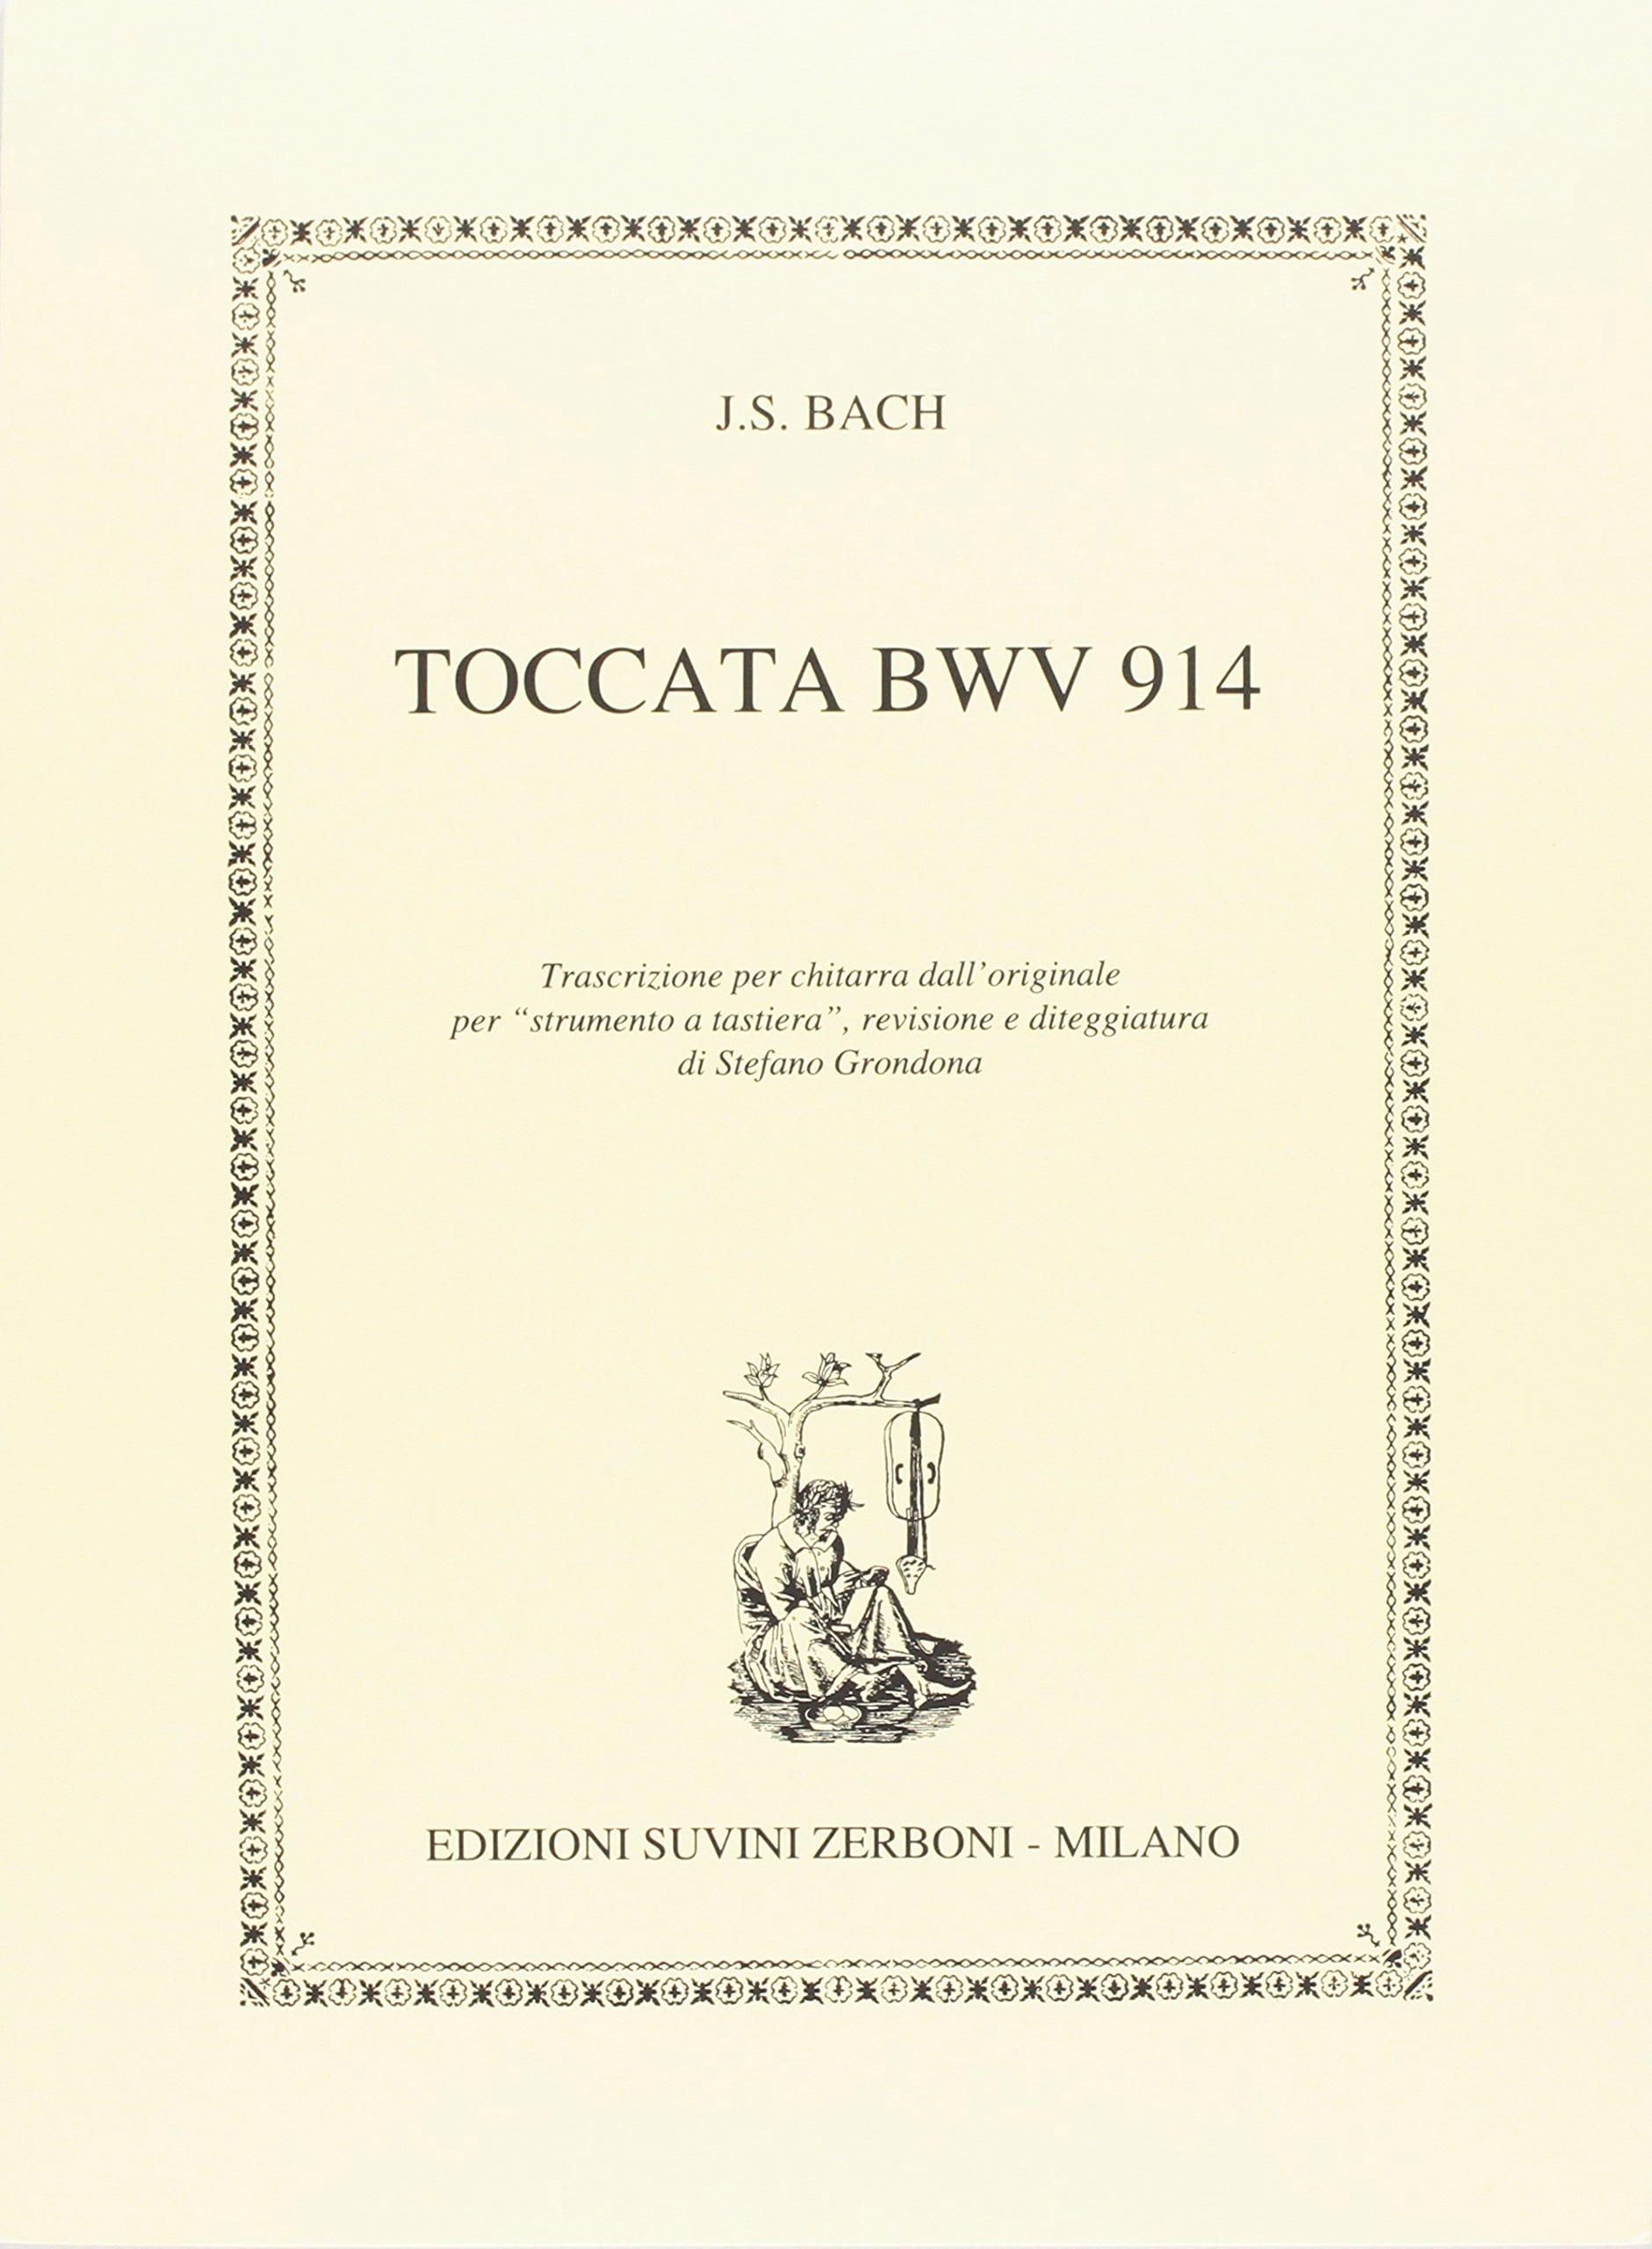 Toccata BWV 914 - BACH - Partition - Guitare - laflutedepan.com